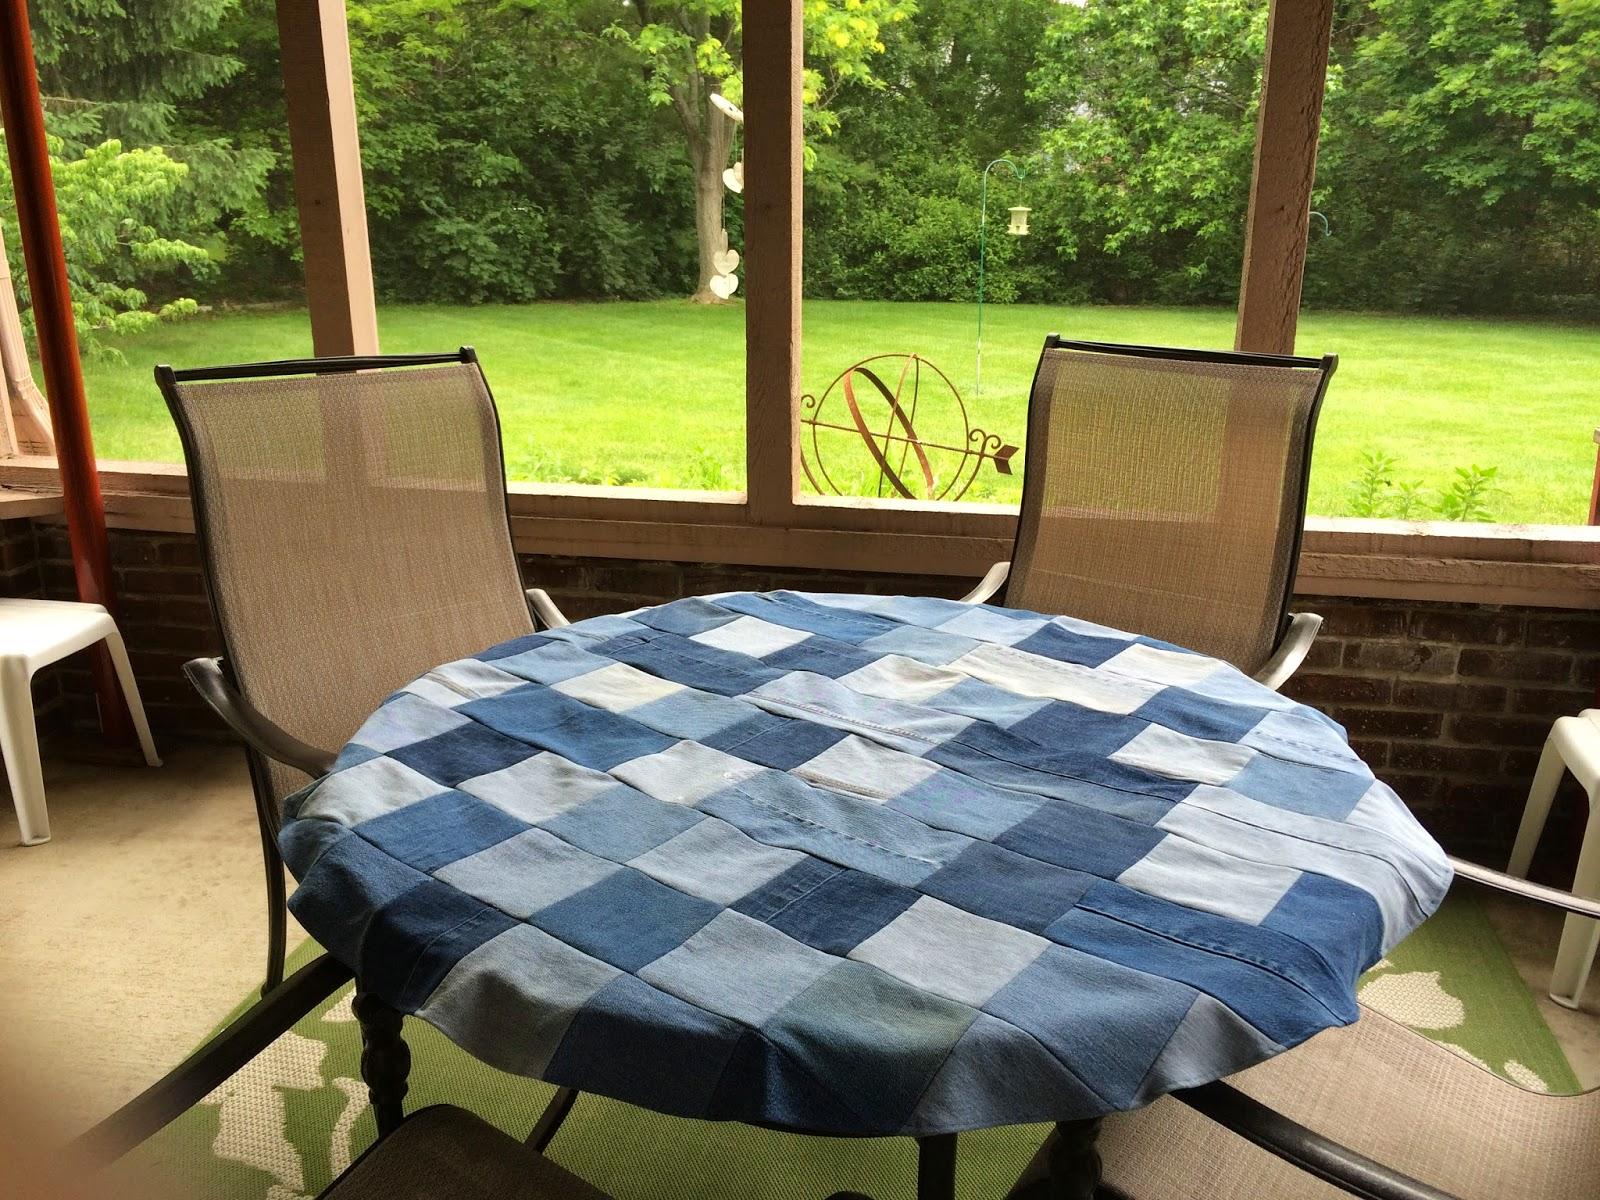 A New Chapter: DIY: Denim patchwork tablecloth